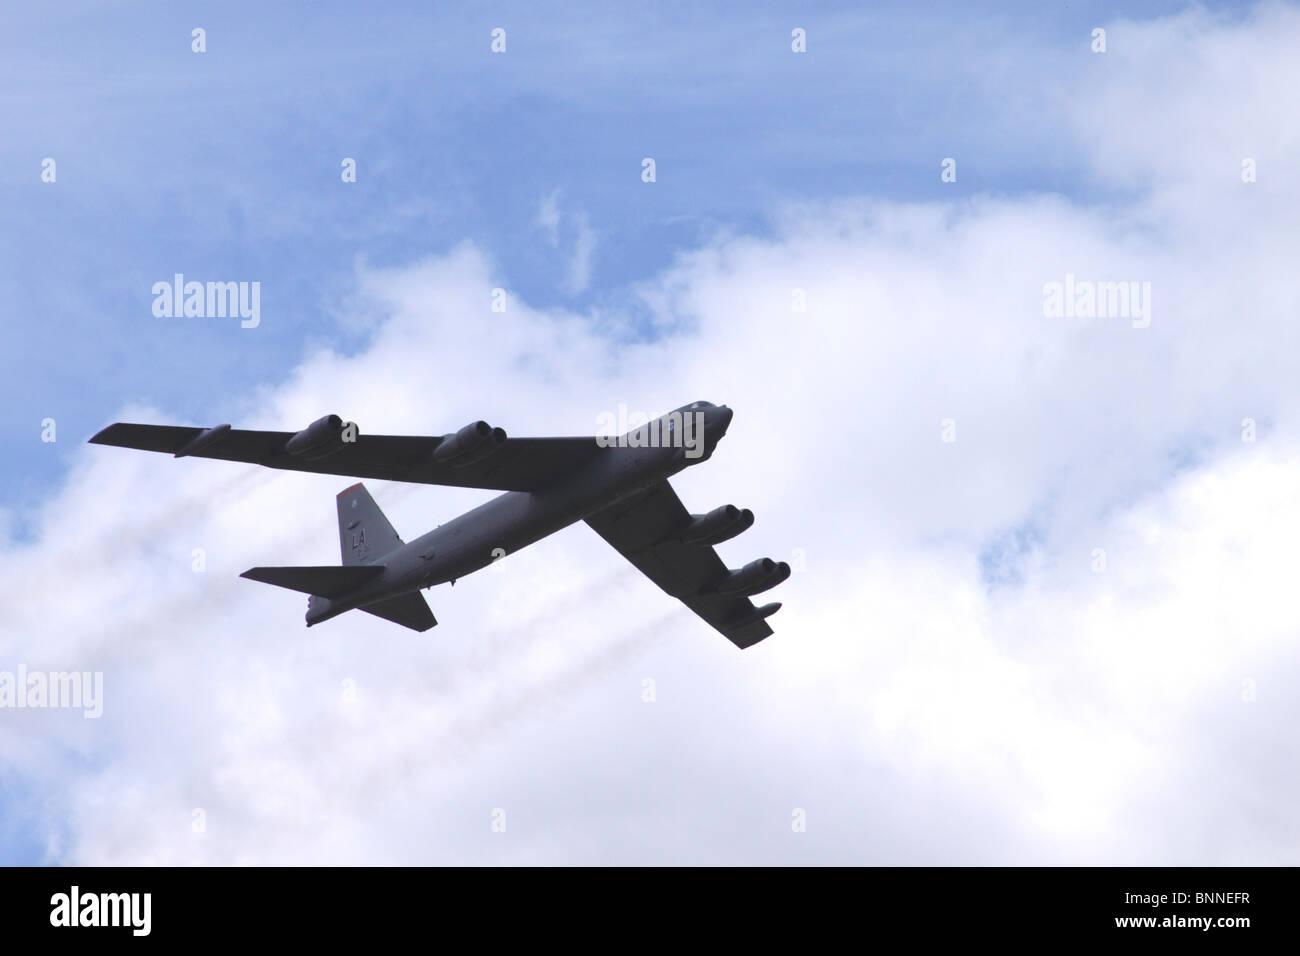 Boeing B52 Stratofortress strategic bomber flying at Farnborough Airshow 2010 Stock Photo